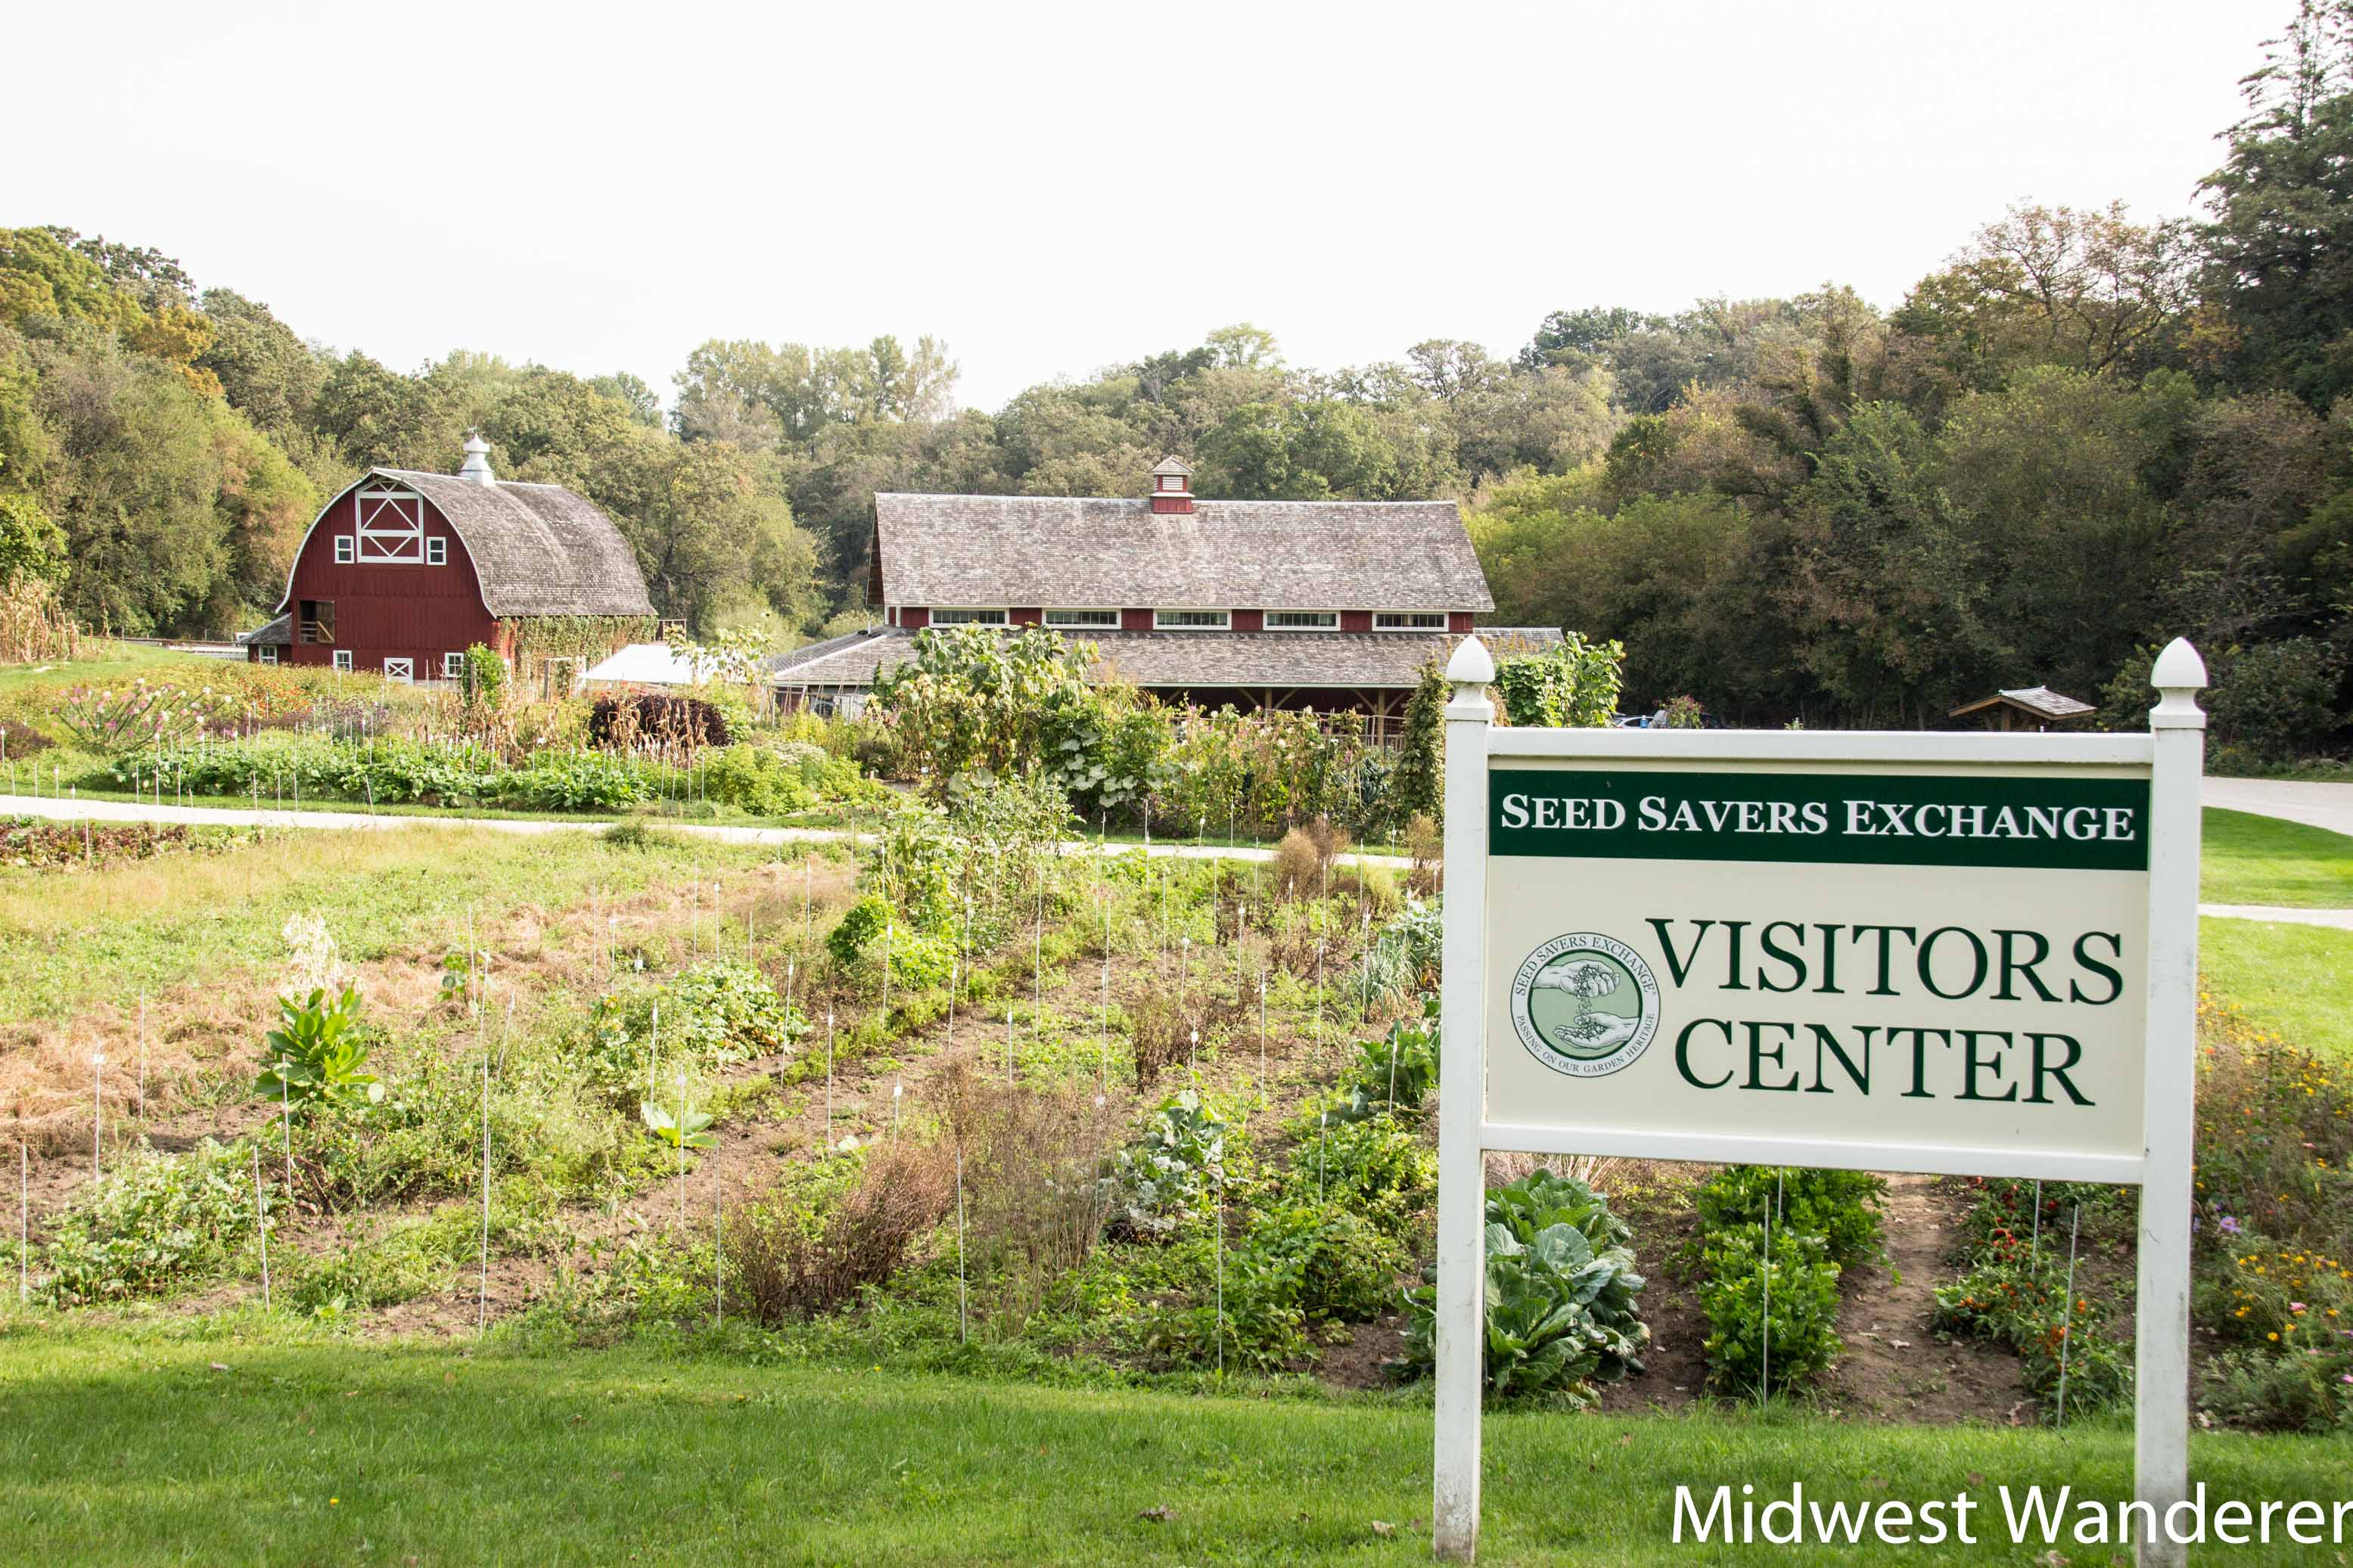 Seed Savers Exchange visitor center